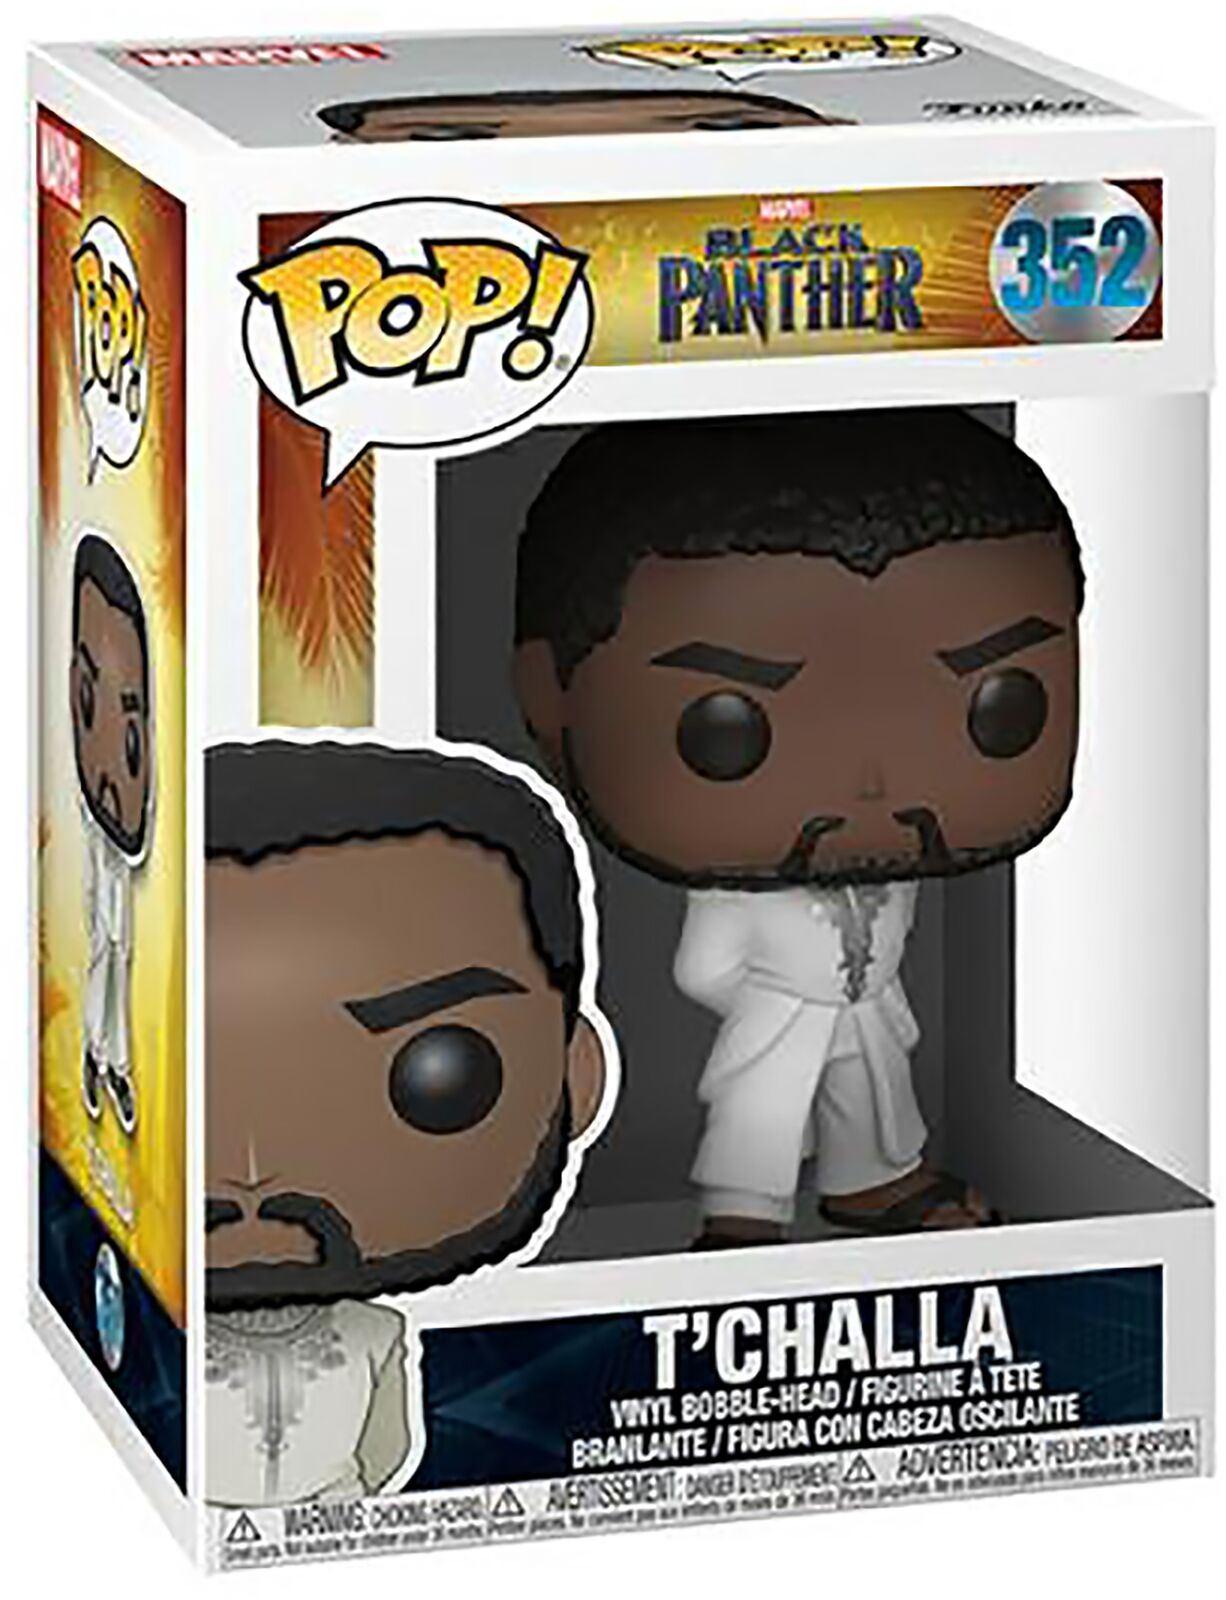 Black Panther T/'Challa With White Robe Vinyl Figure #352 Funko Pop